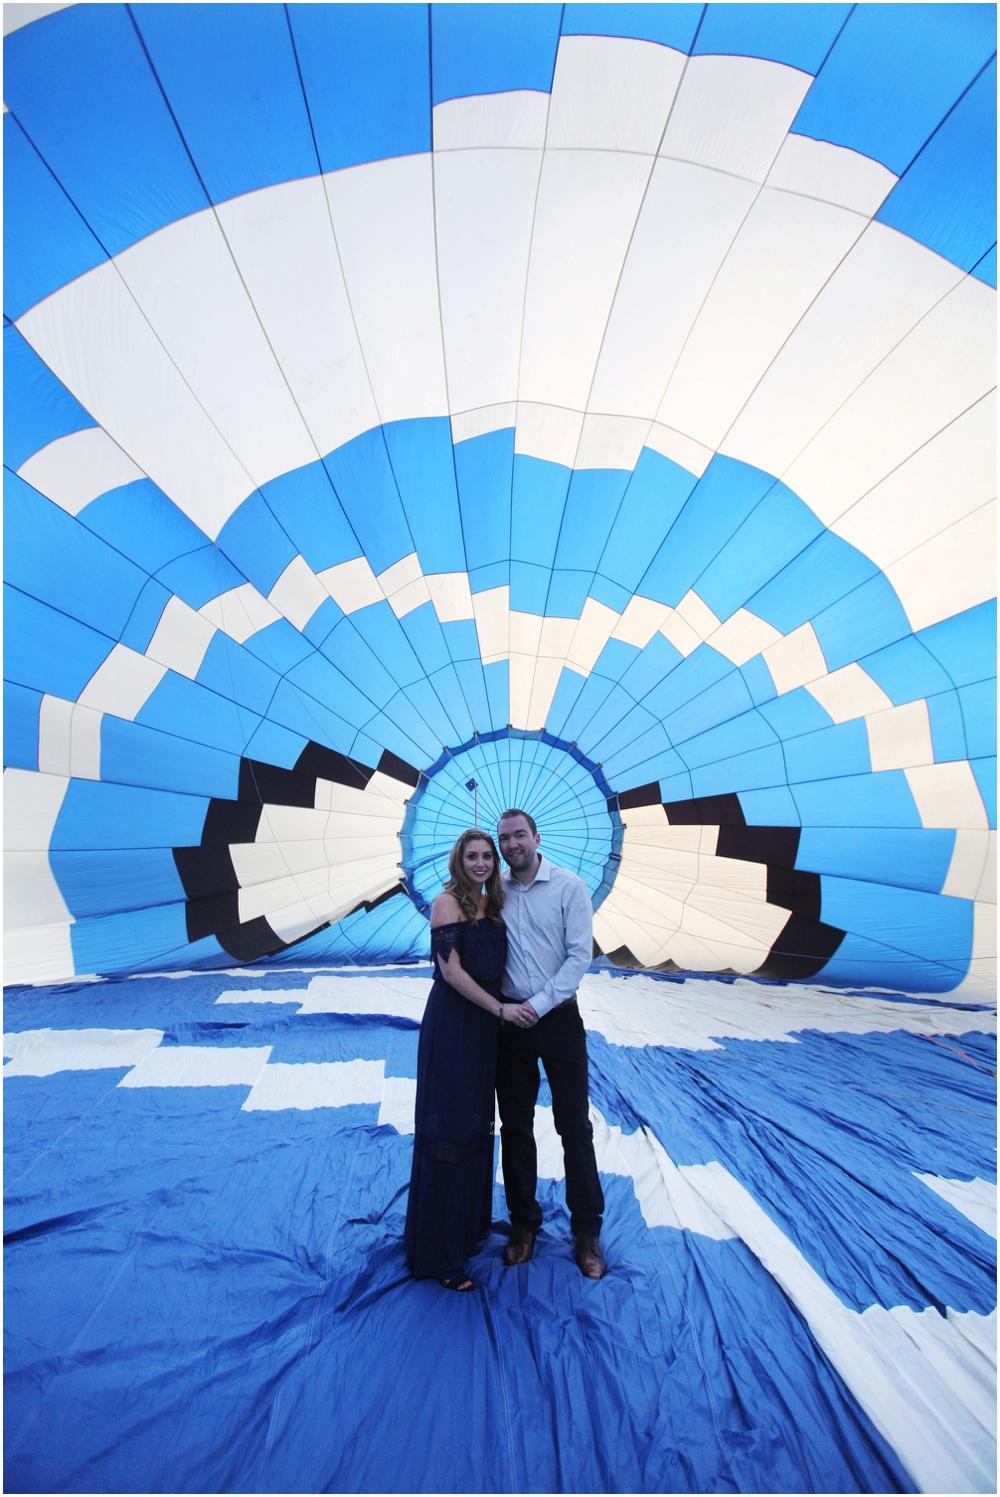 Mahone-Bay-Hot-Air-Balloon-Engagement-Session-Chantal-Routhier-Photography_0009.jpg